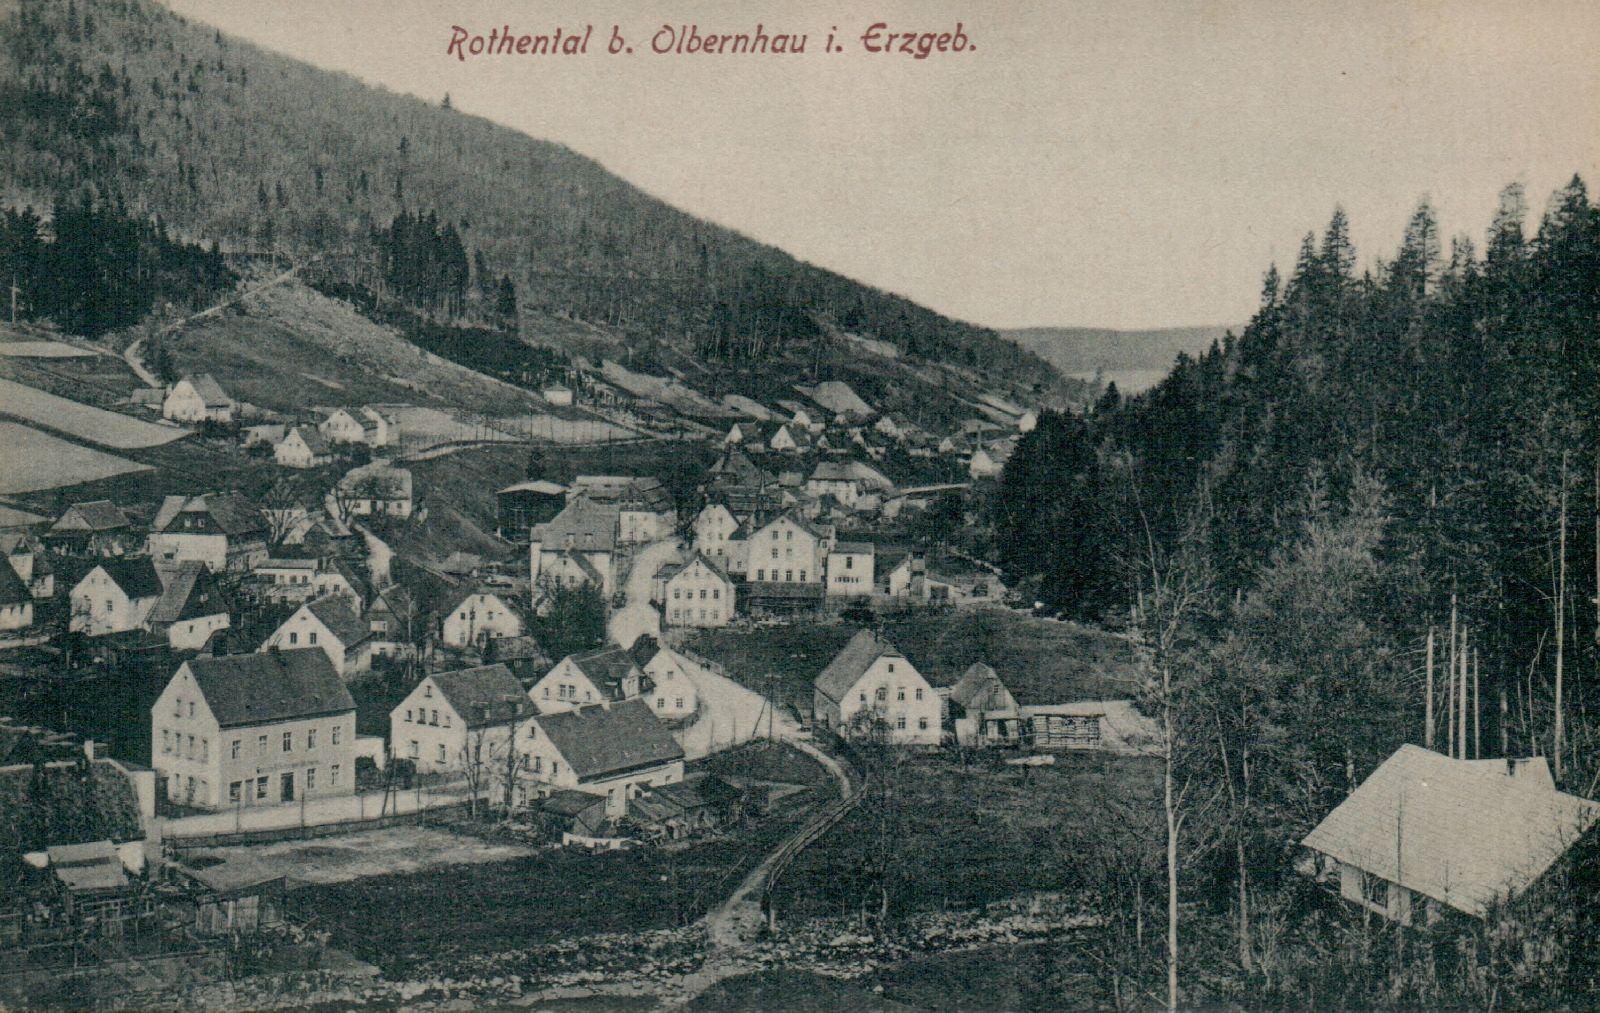 Rothenthal bei Olbernhau im Erzgebirge